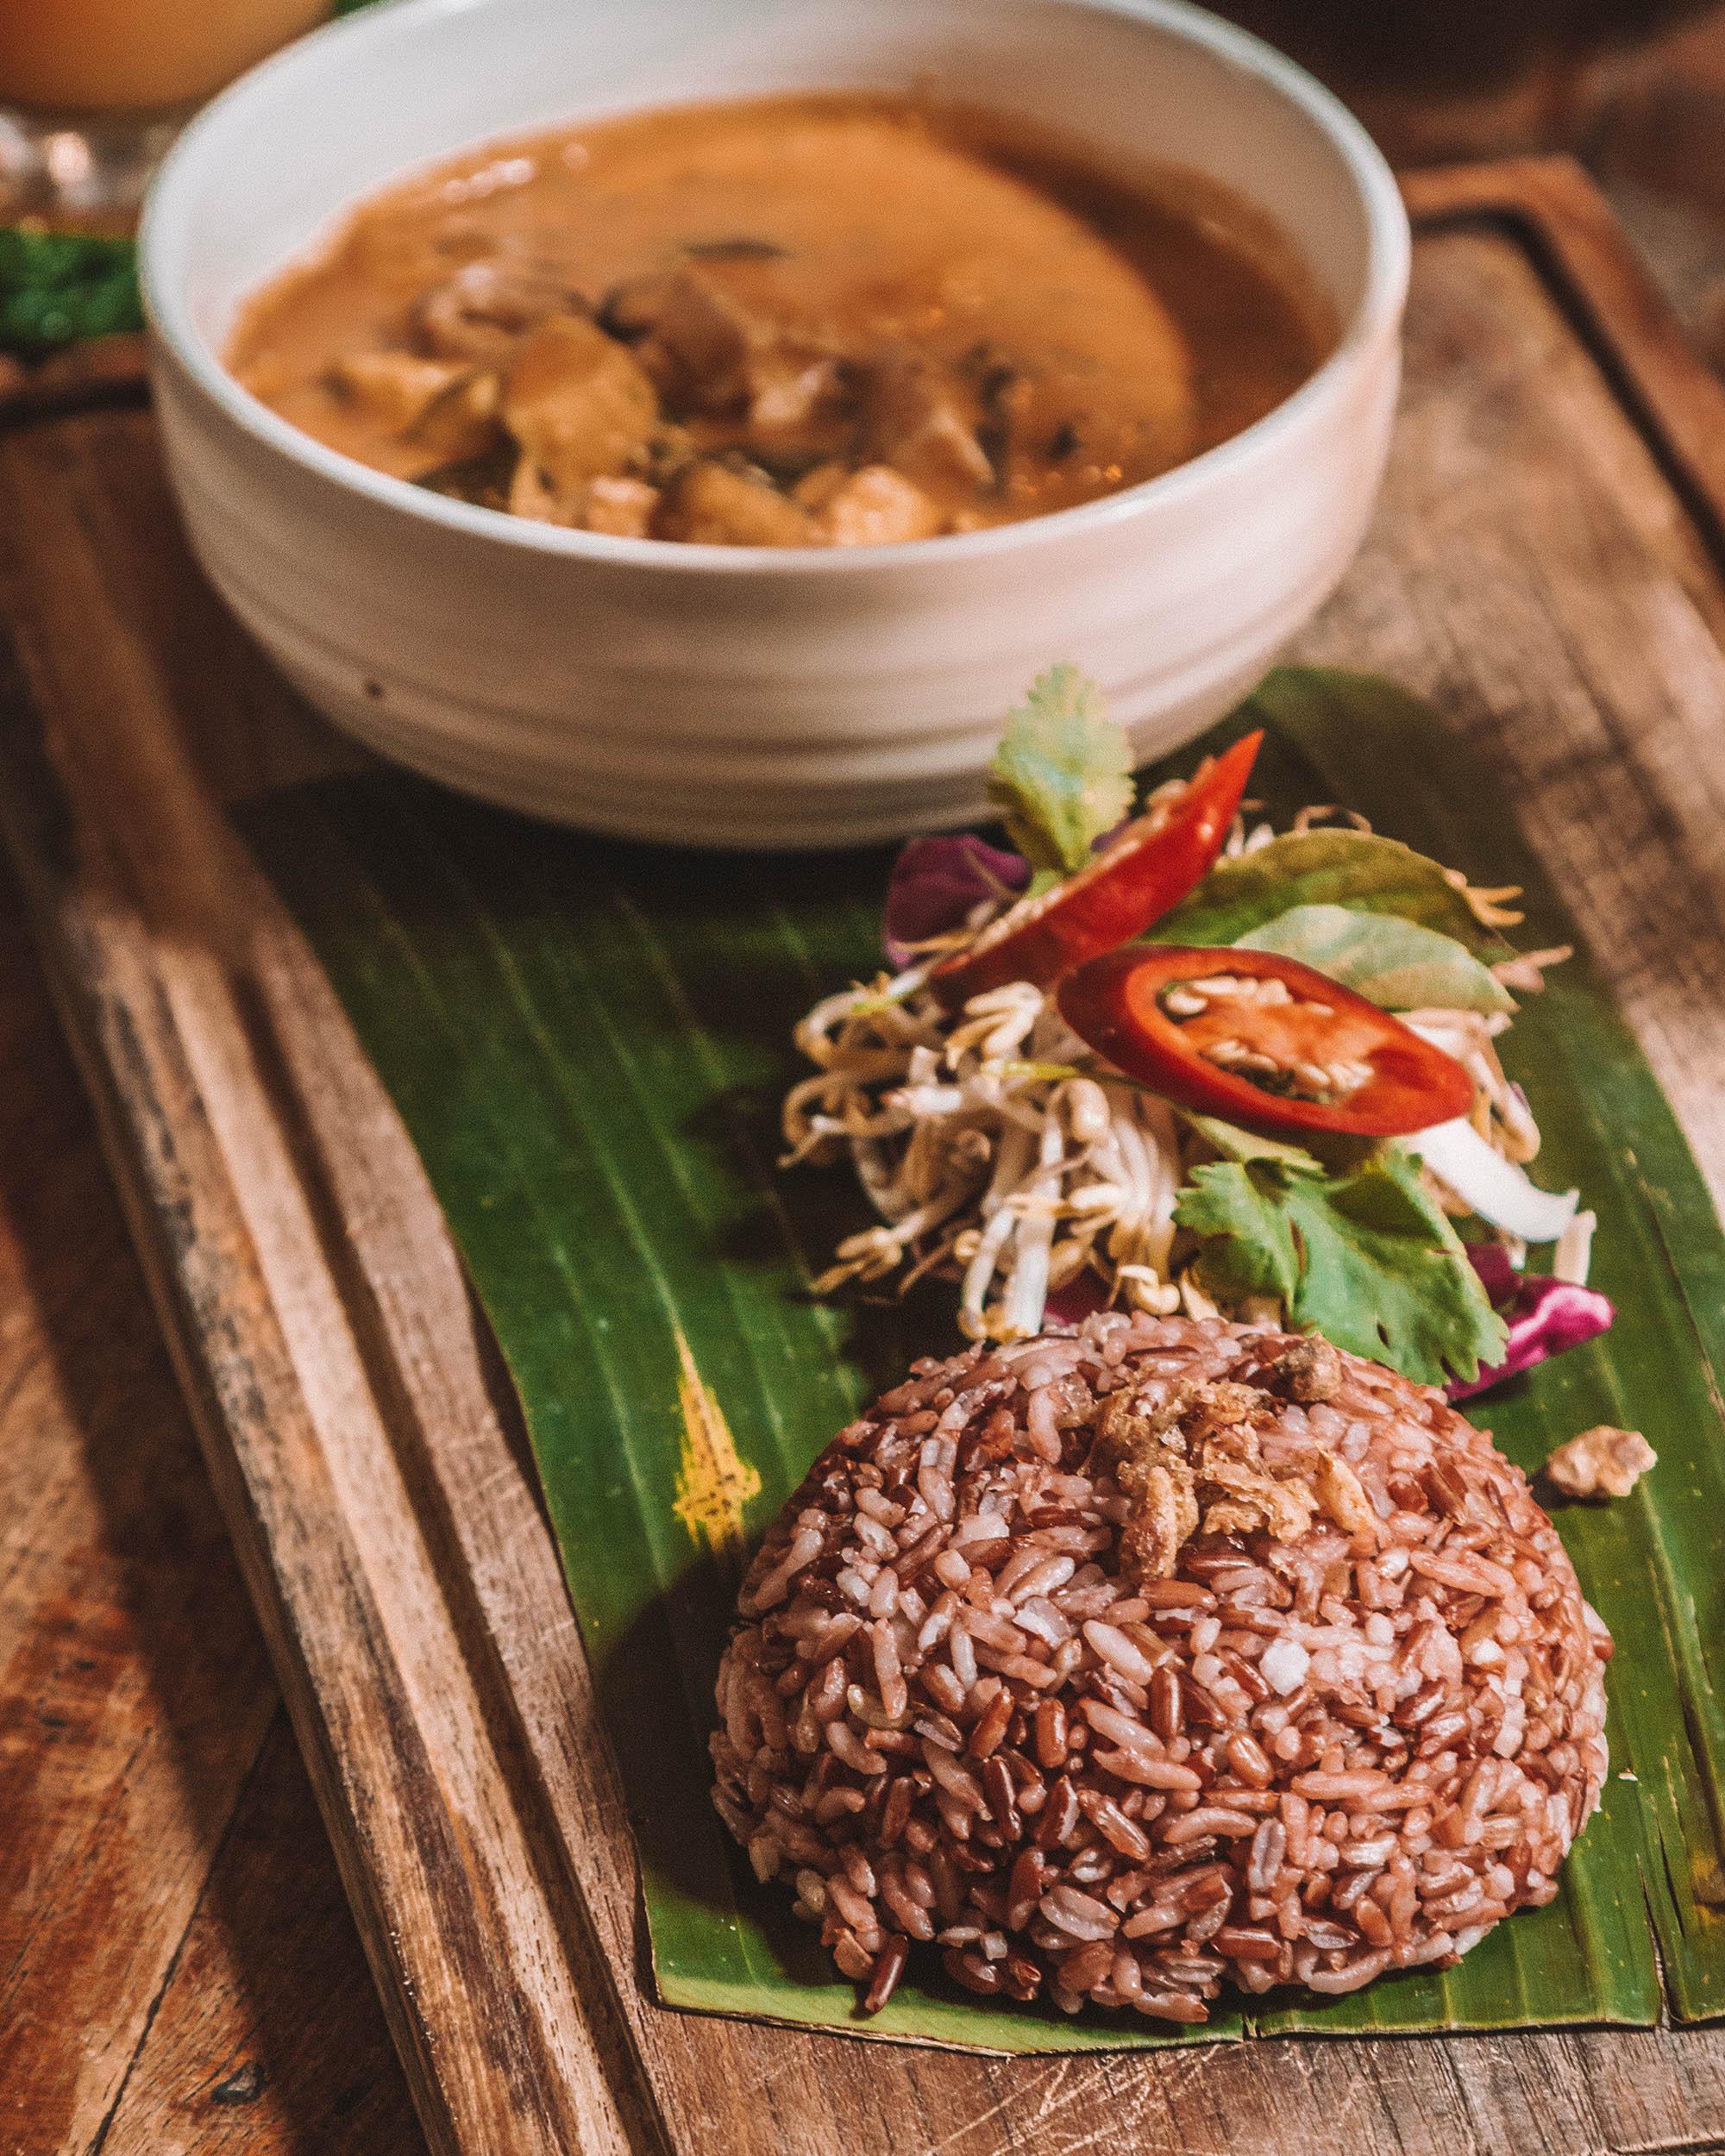 my warung traditional indonesian food canggu bali vegan options vegetarian delicious affordable prices